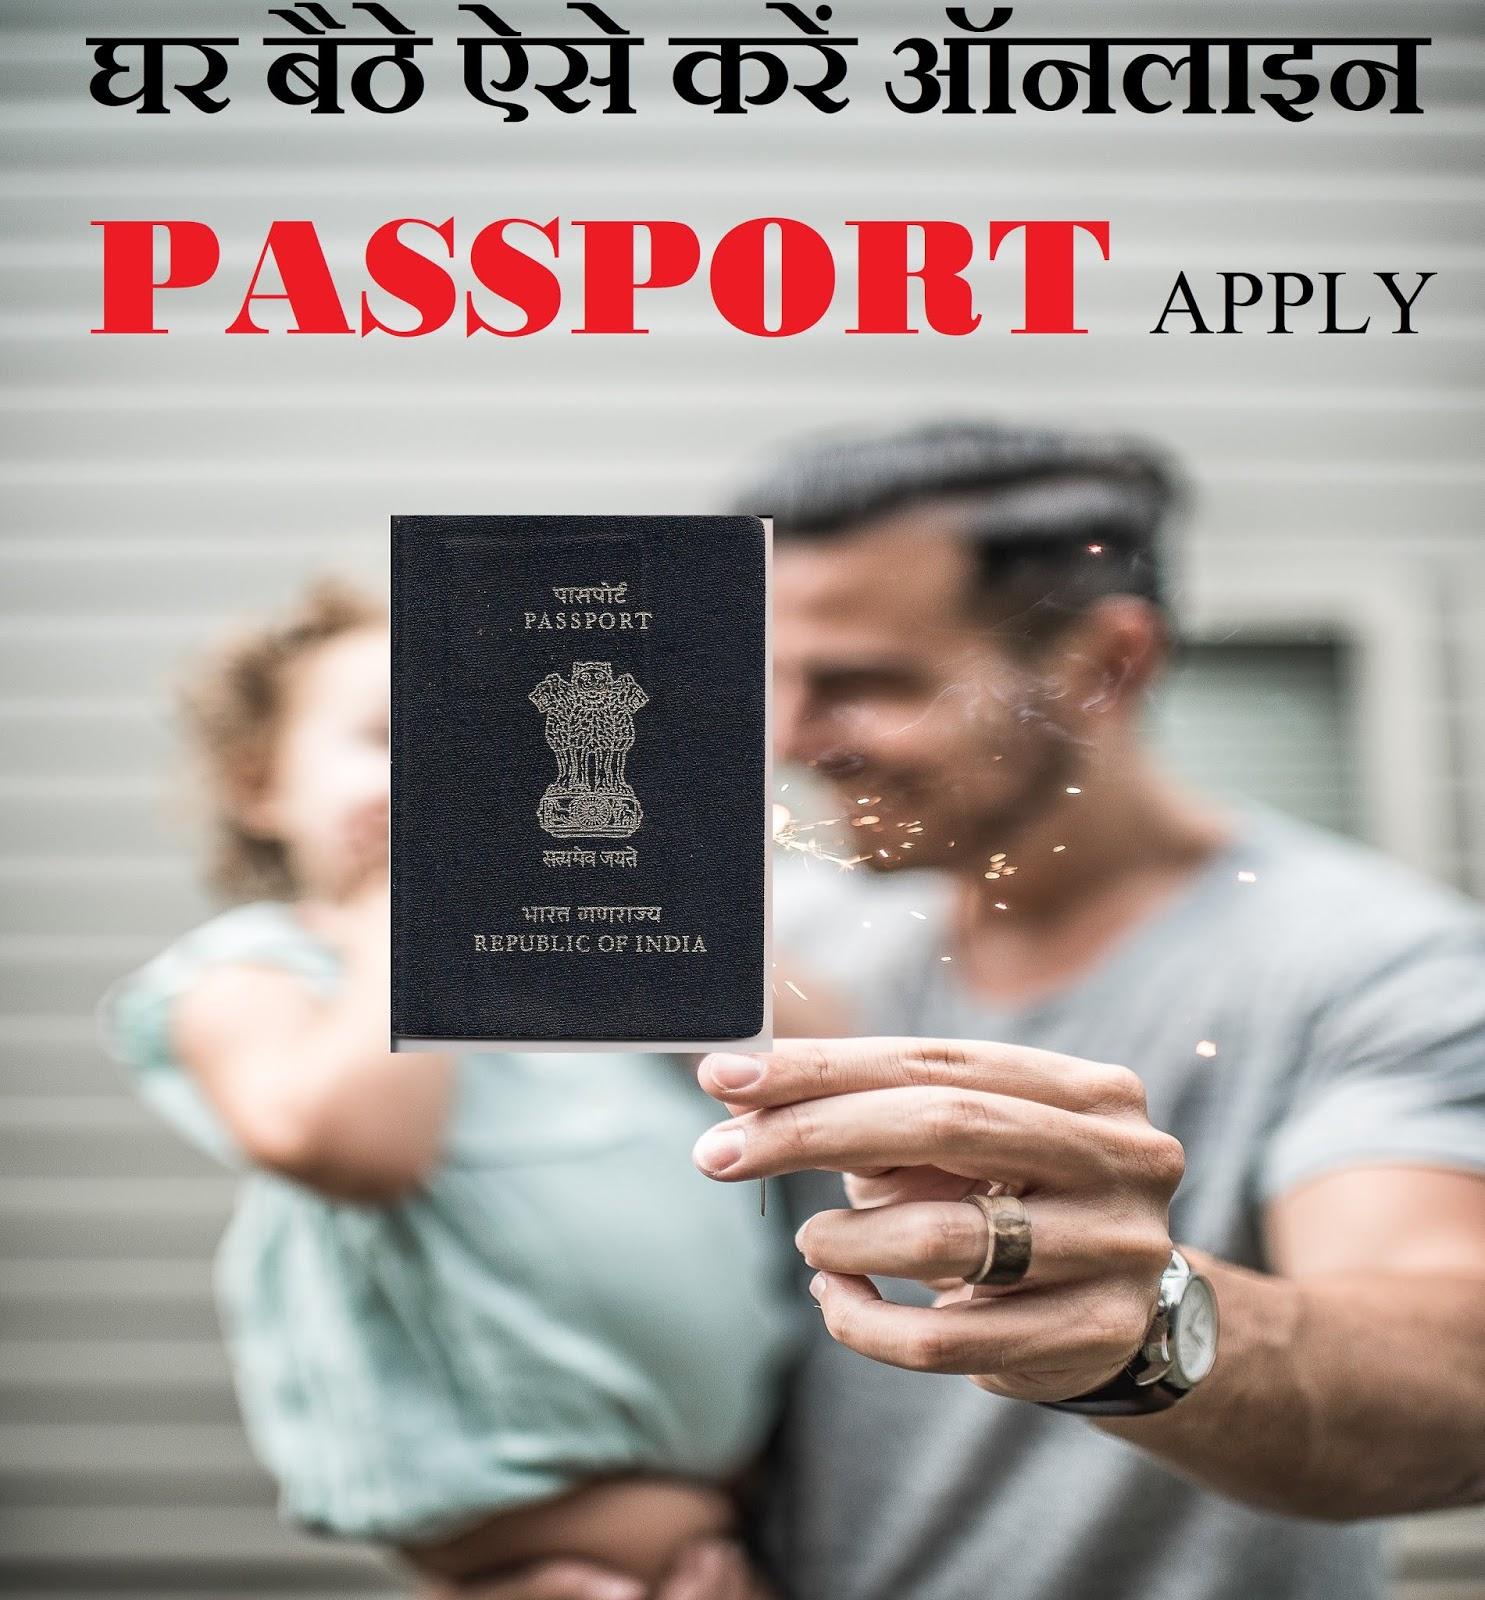 How to Apply Passport Online घर बैठे ऐसे करें ऑनलाइन आवेदन